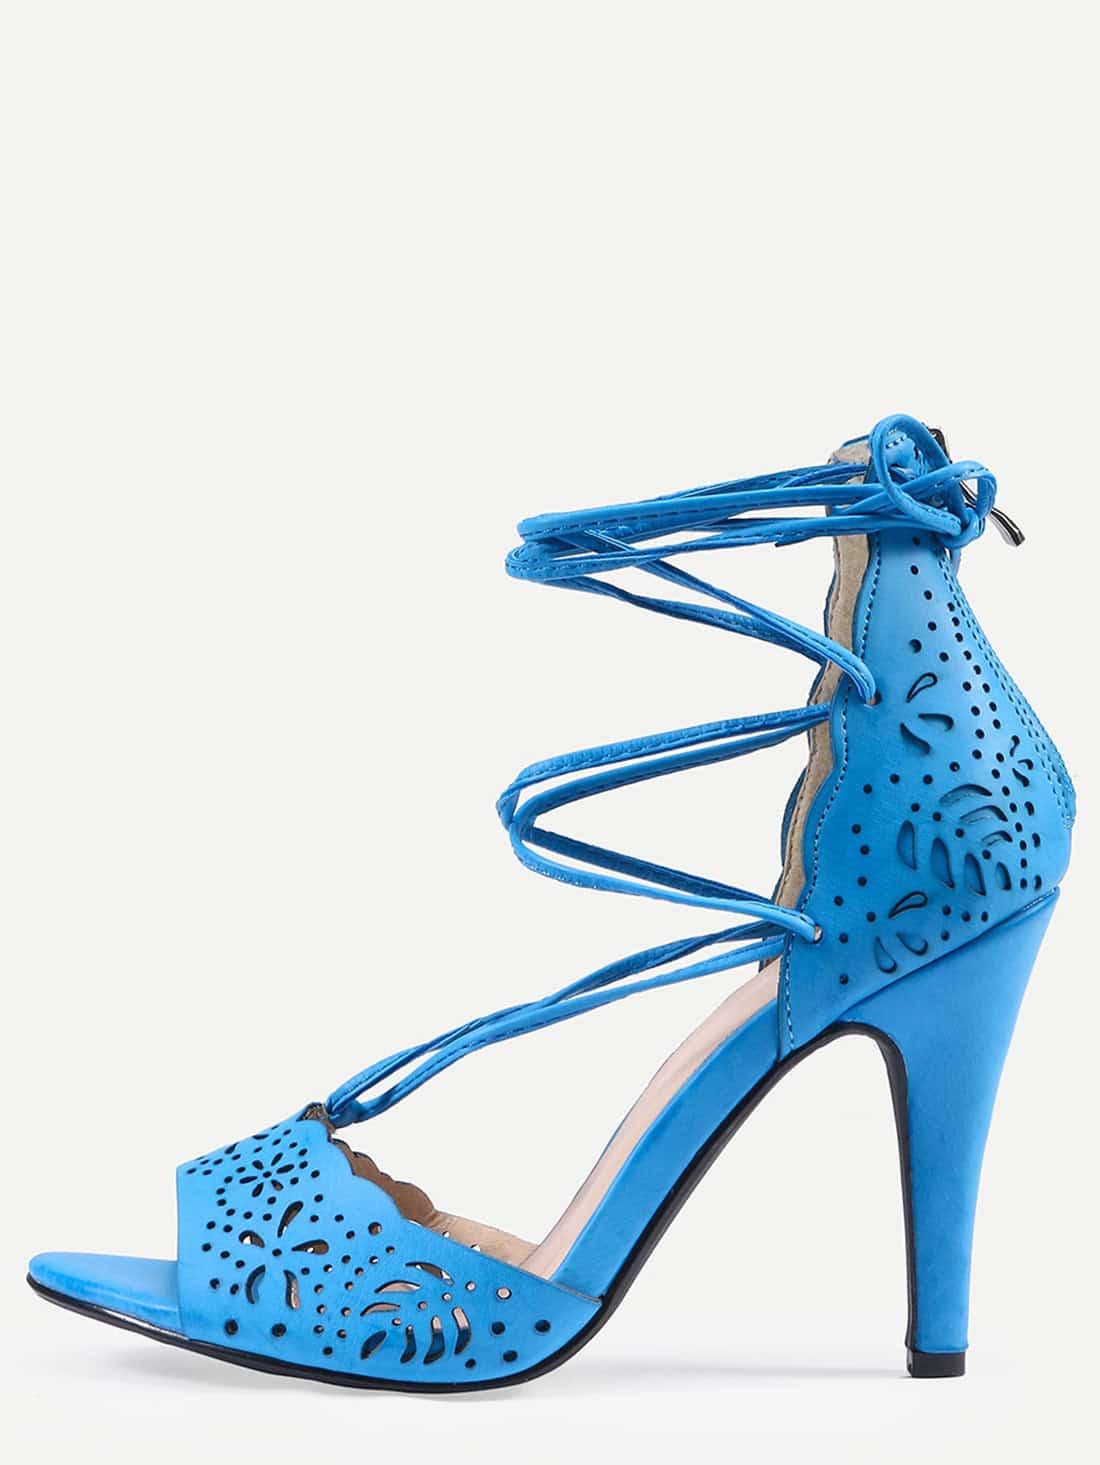 Laser-Cut Lace-Up Peep Toe Dorsay Sandals - BlueLaser-Cut Lace-Up Peep Toe Dorsay Sandals - Blue<br><br>color: Blue<br>size: US6.5,US6,US7.5,US7,US8.5,US8,US9